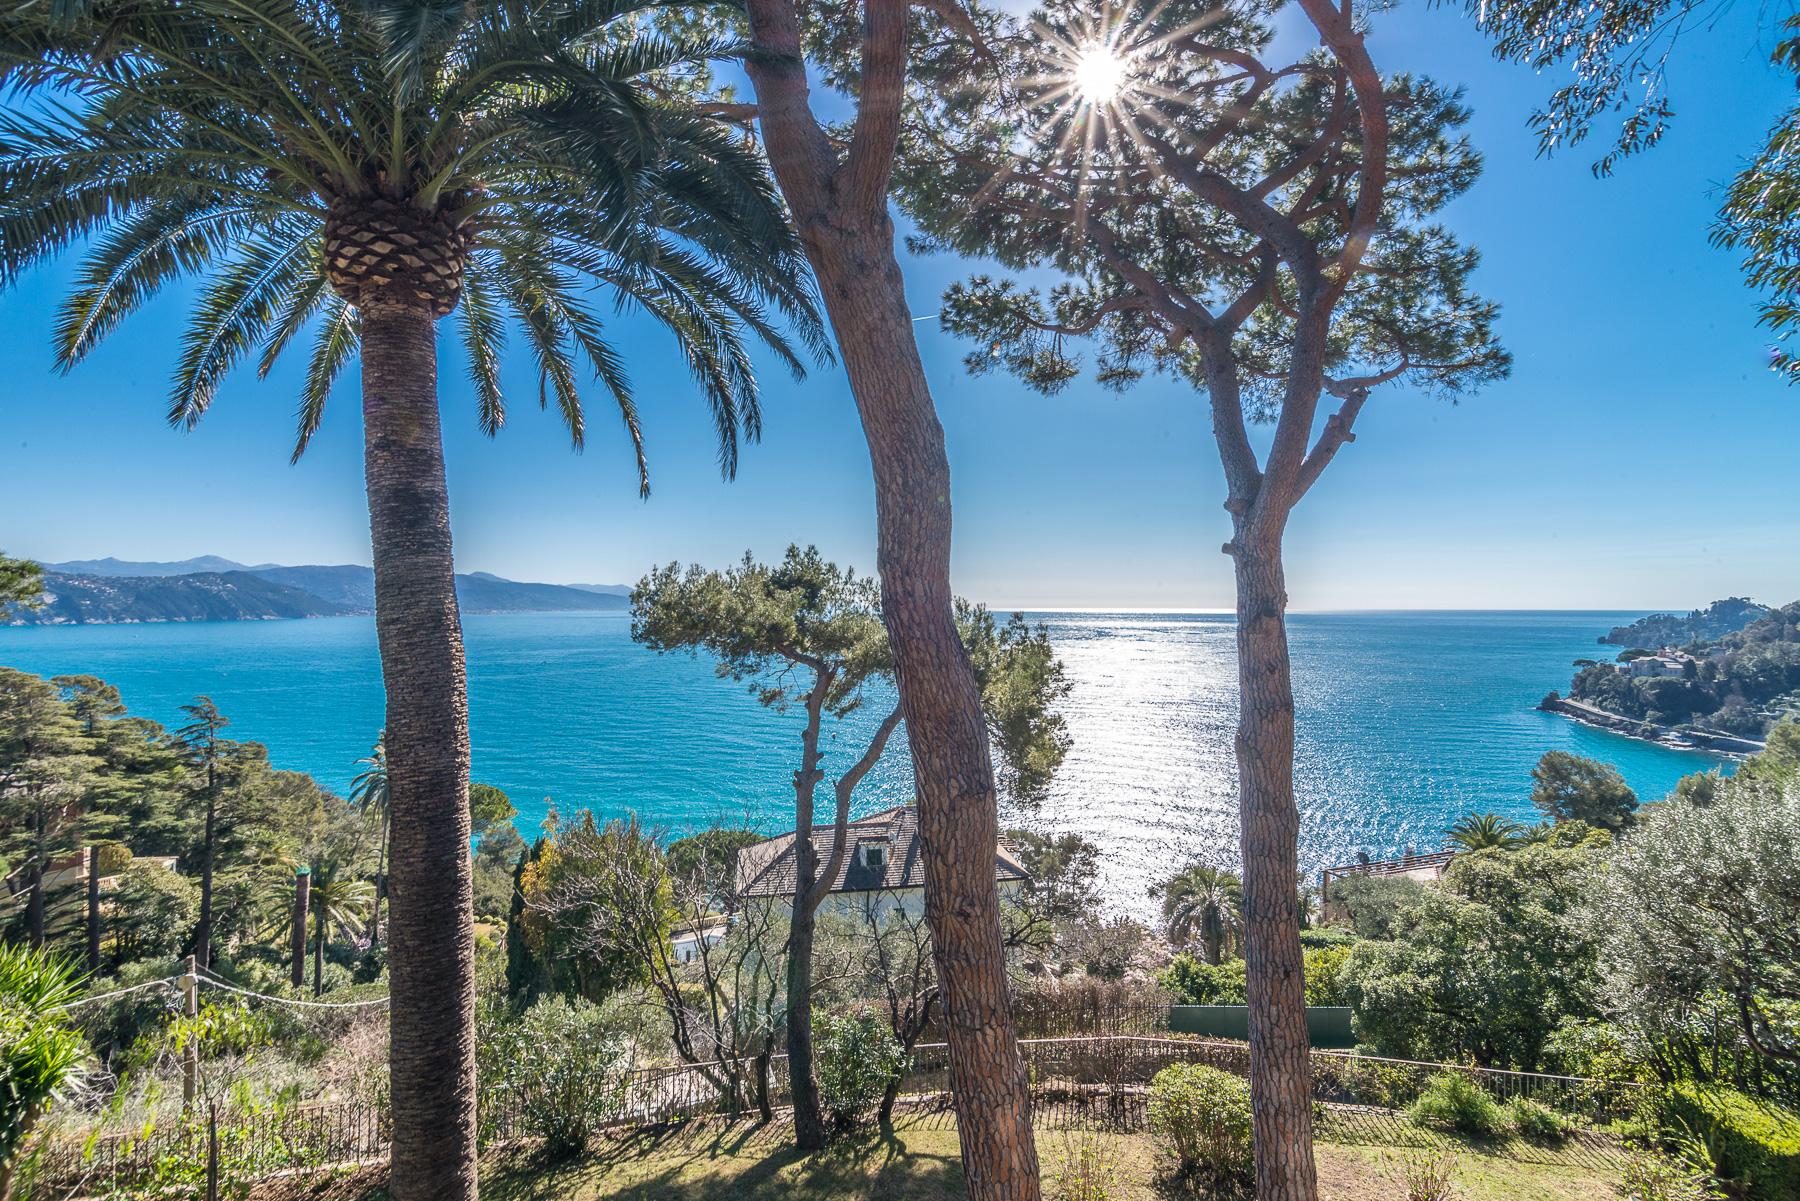 Villa in Vendita a Santa Margherita Ligure: 5 locali, 440 mq - Foto 13